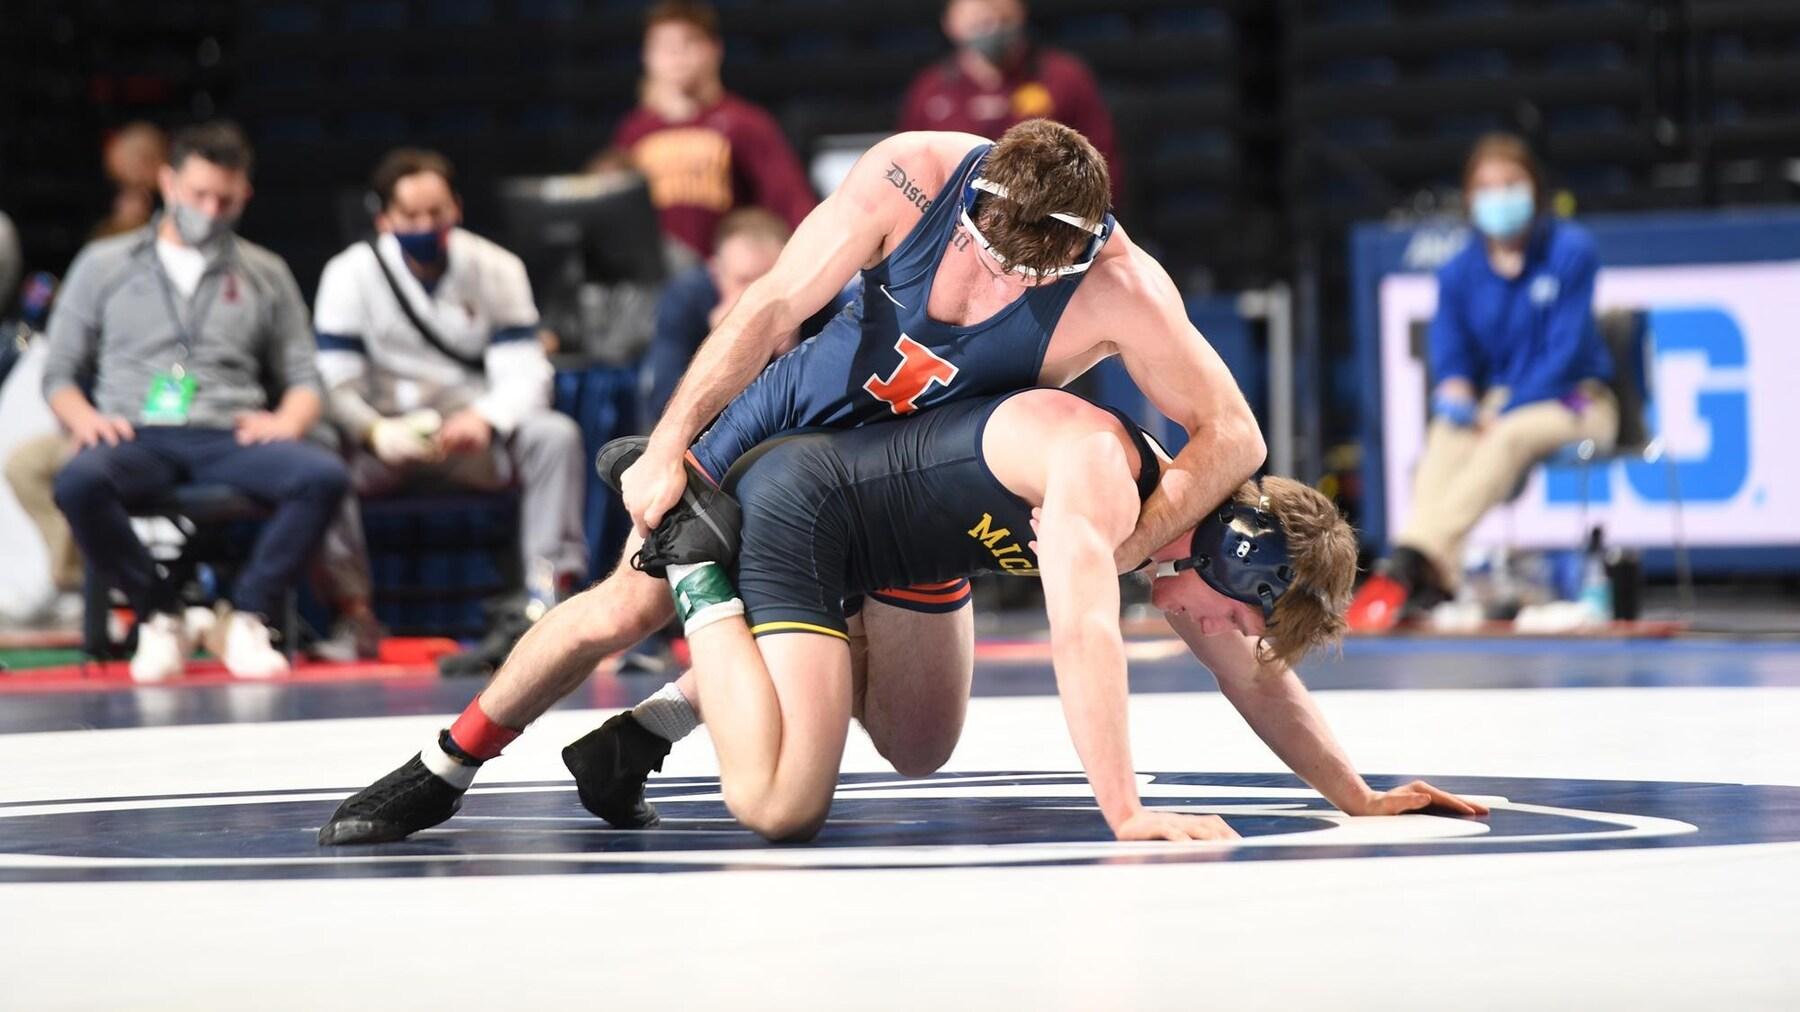 An Illini wrestler grapples with a Michigan wrestler